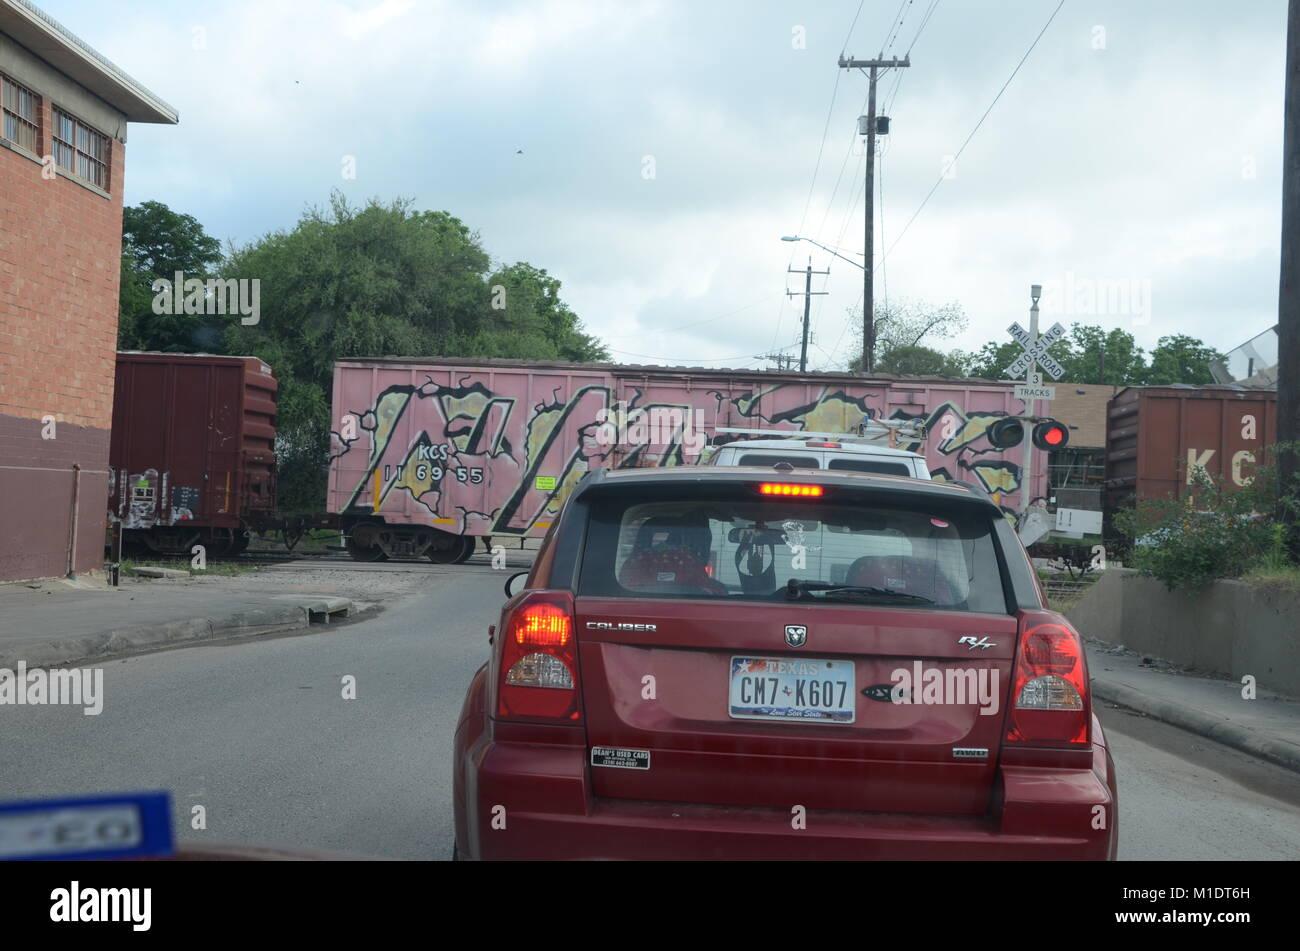 Grande Ford San Antonio Texas >> Texas State Railroad Stock Photos & Texas State Railroad Stock Images - Alamy